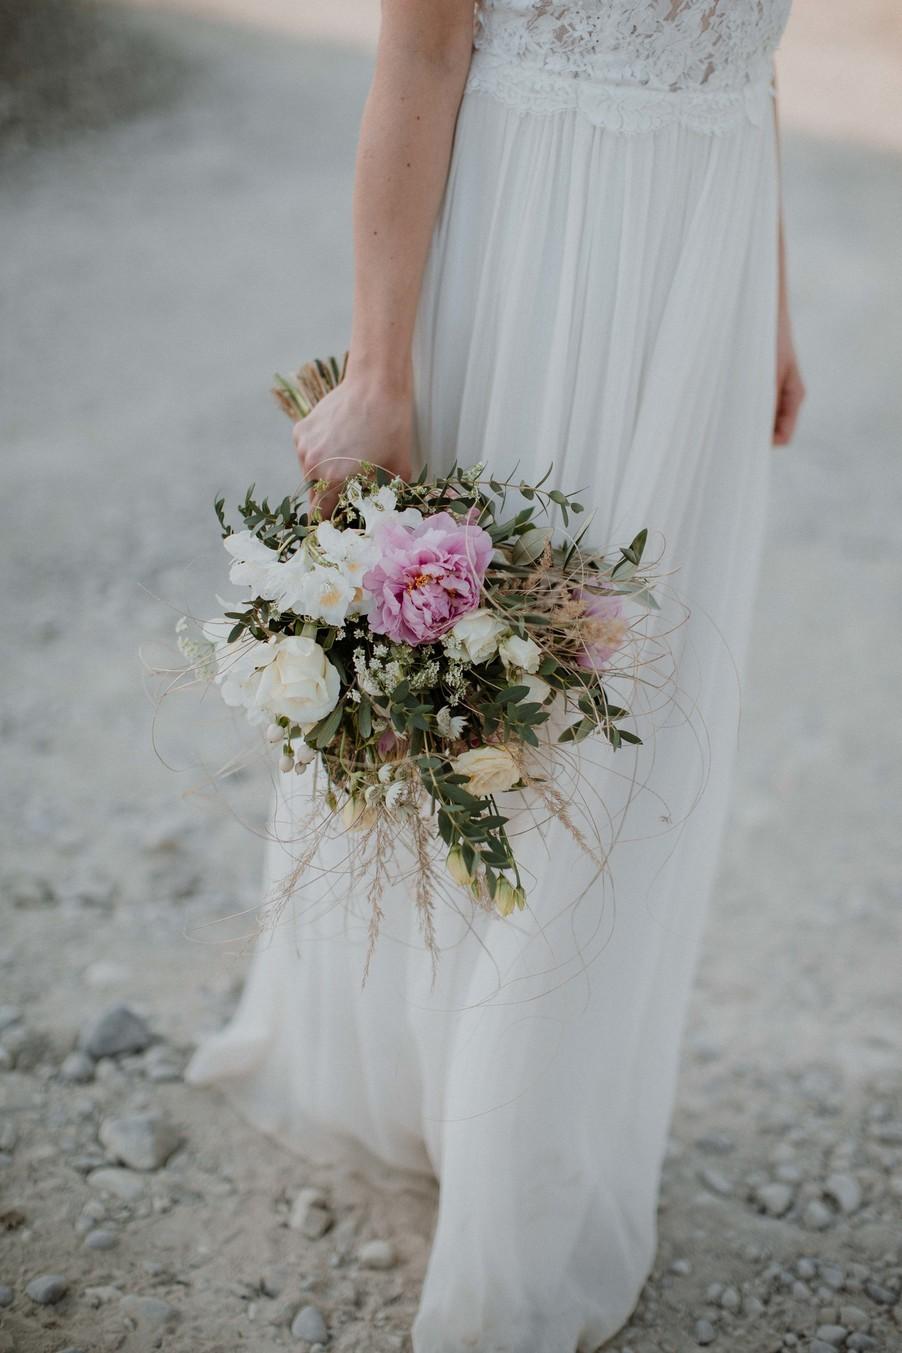 Wildflower_Julia_Pommerenke_Kiesgrube-15